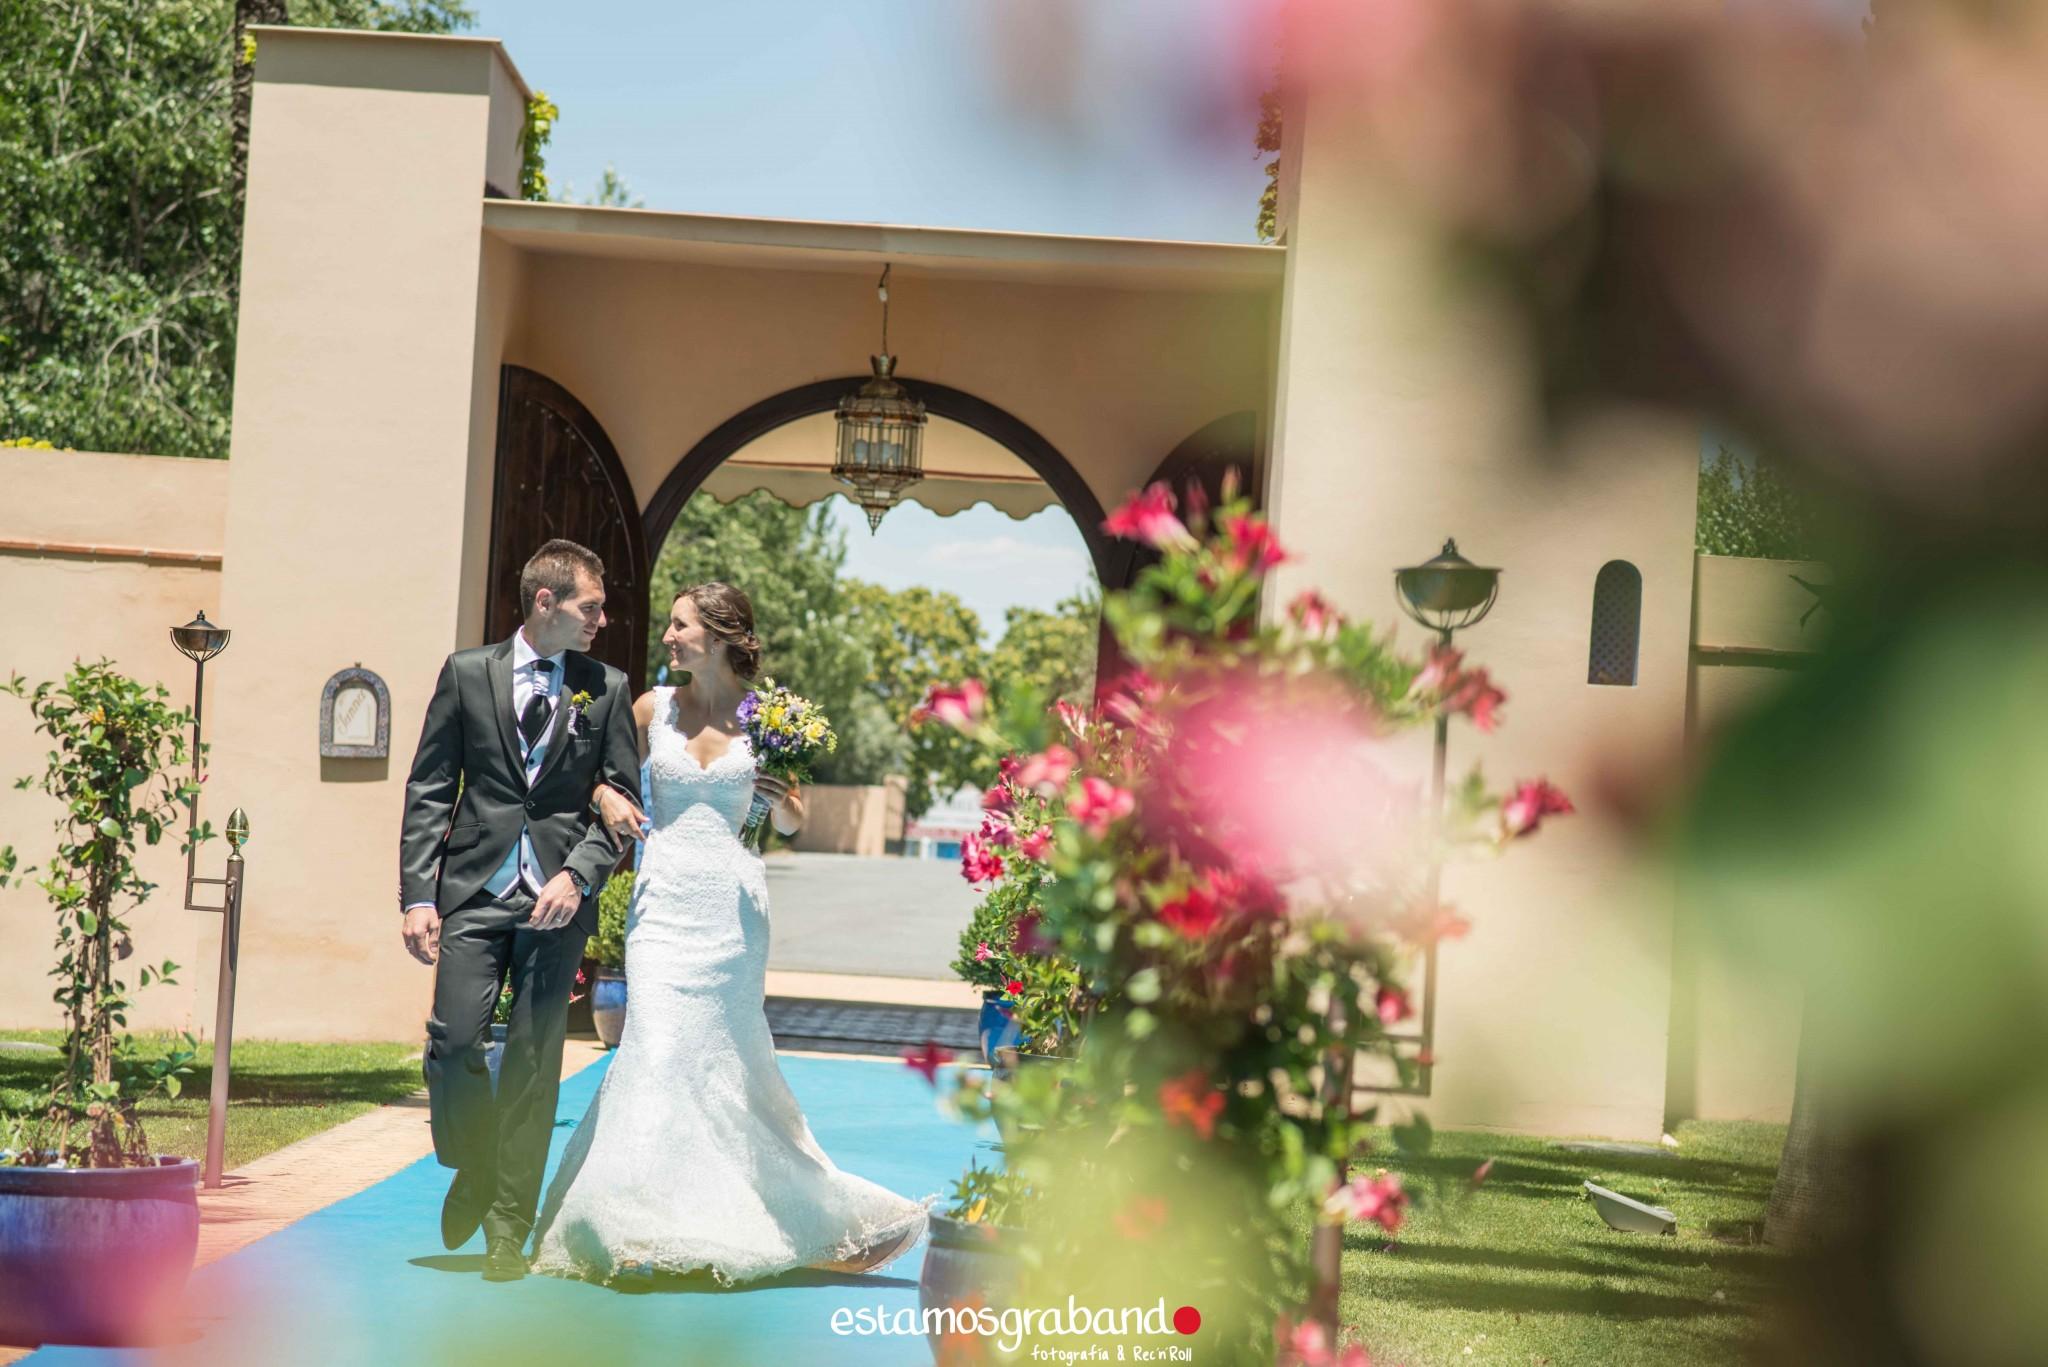 LEO-Y-PEDRO-44 Fotografía de Boda_Leo & Pedro [Jardines de la Mamunia, Granada] - video boda cadiz